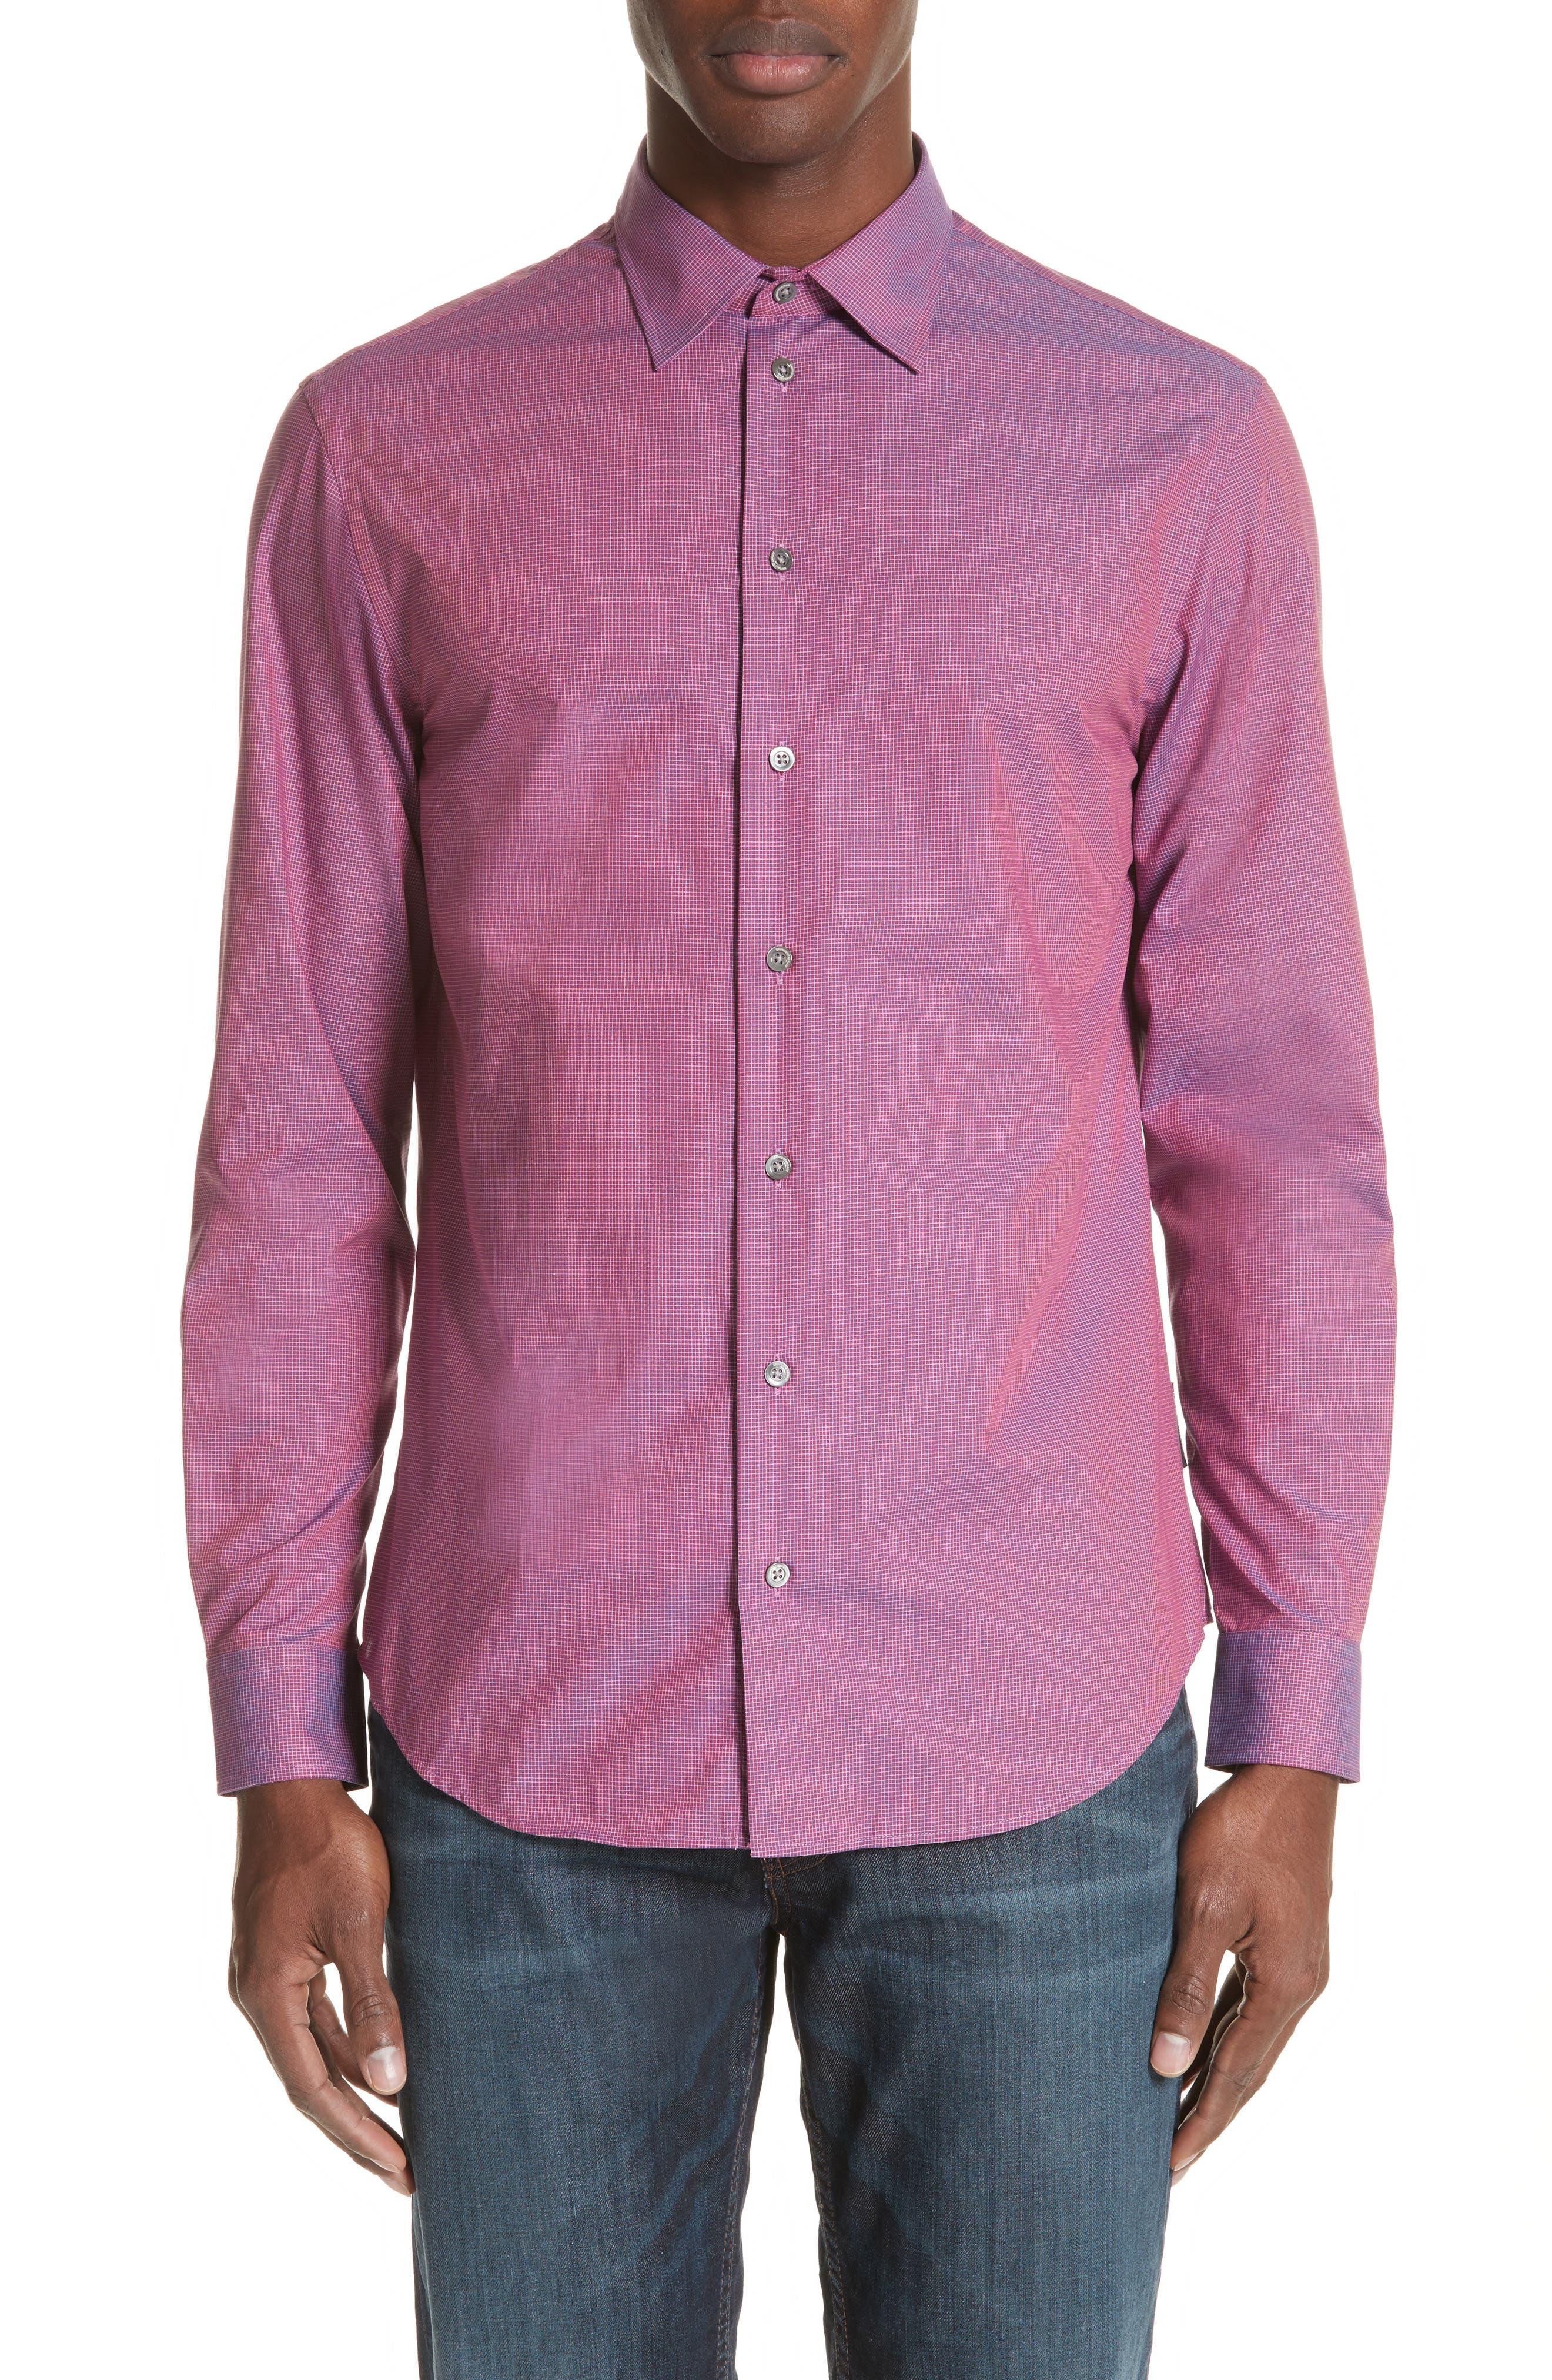 Main Image - Emporio Armani Microcheck Classic Fit Sport Shirt